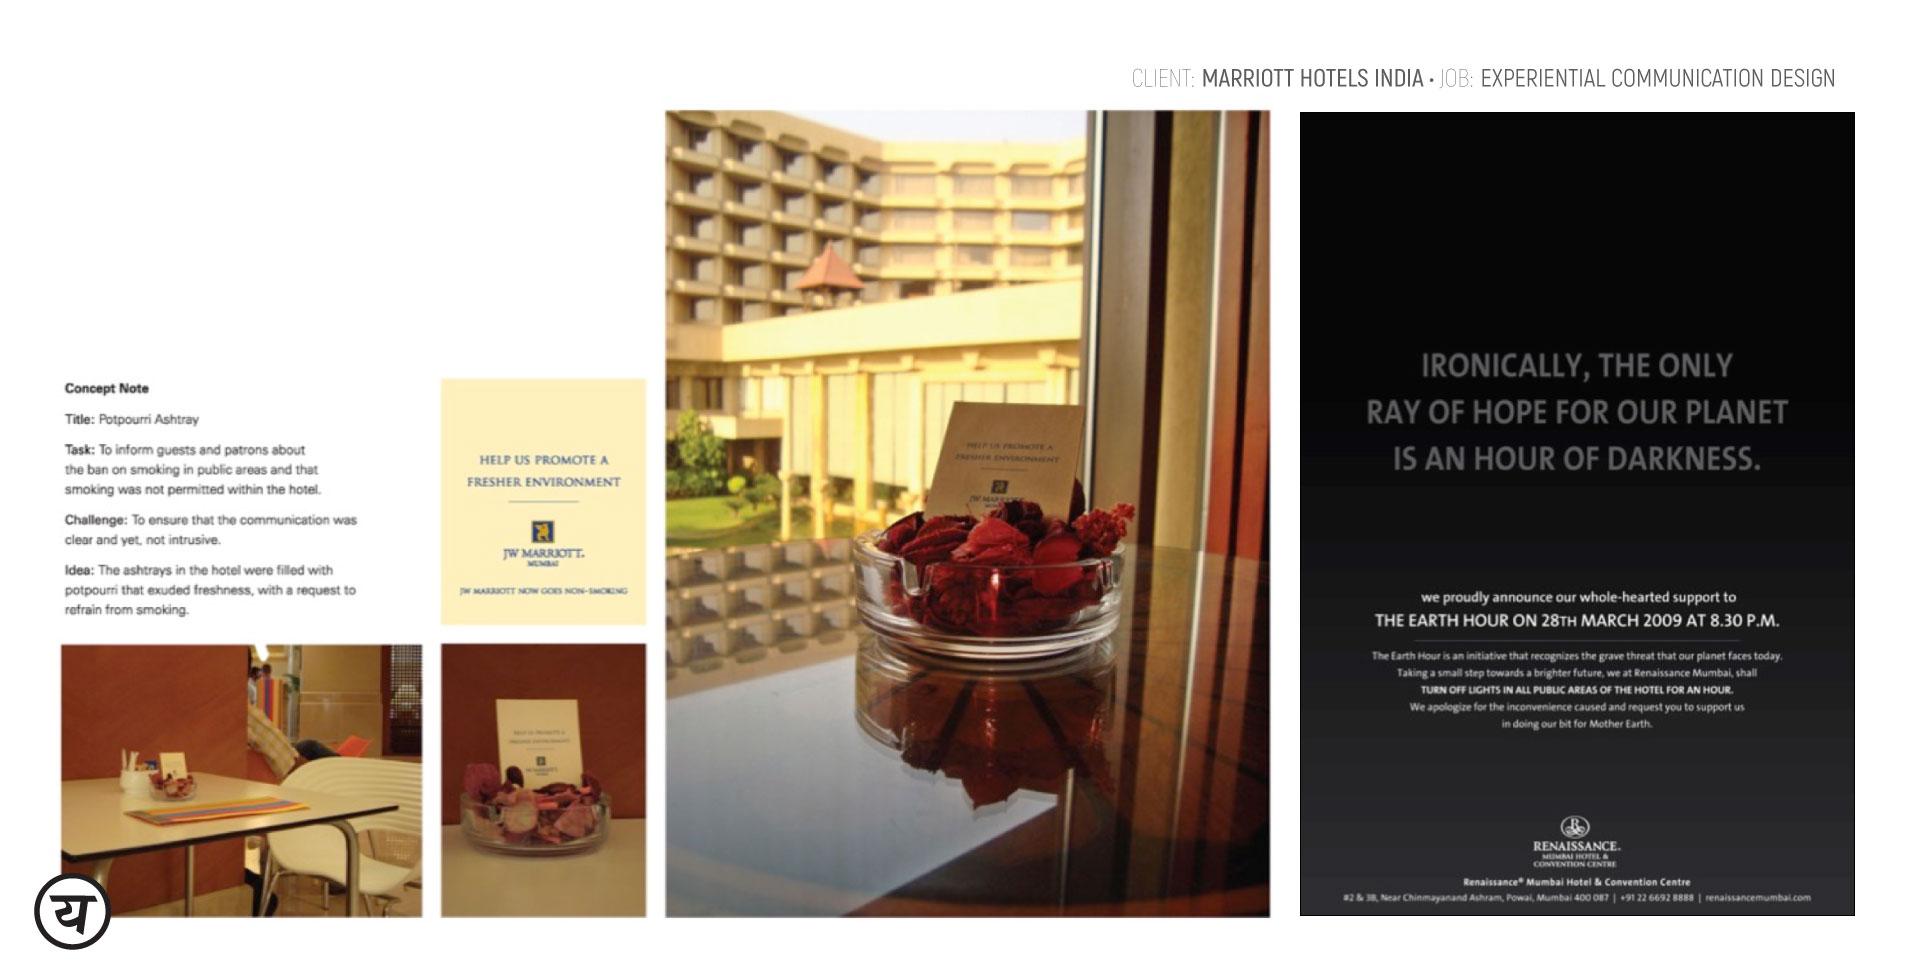 YesYesWhyNot_Communication-Design_Marriott-#4_04.08.19